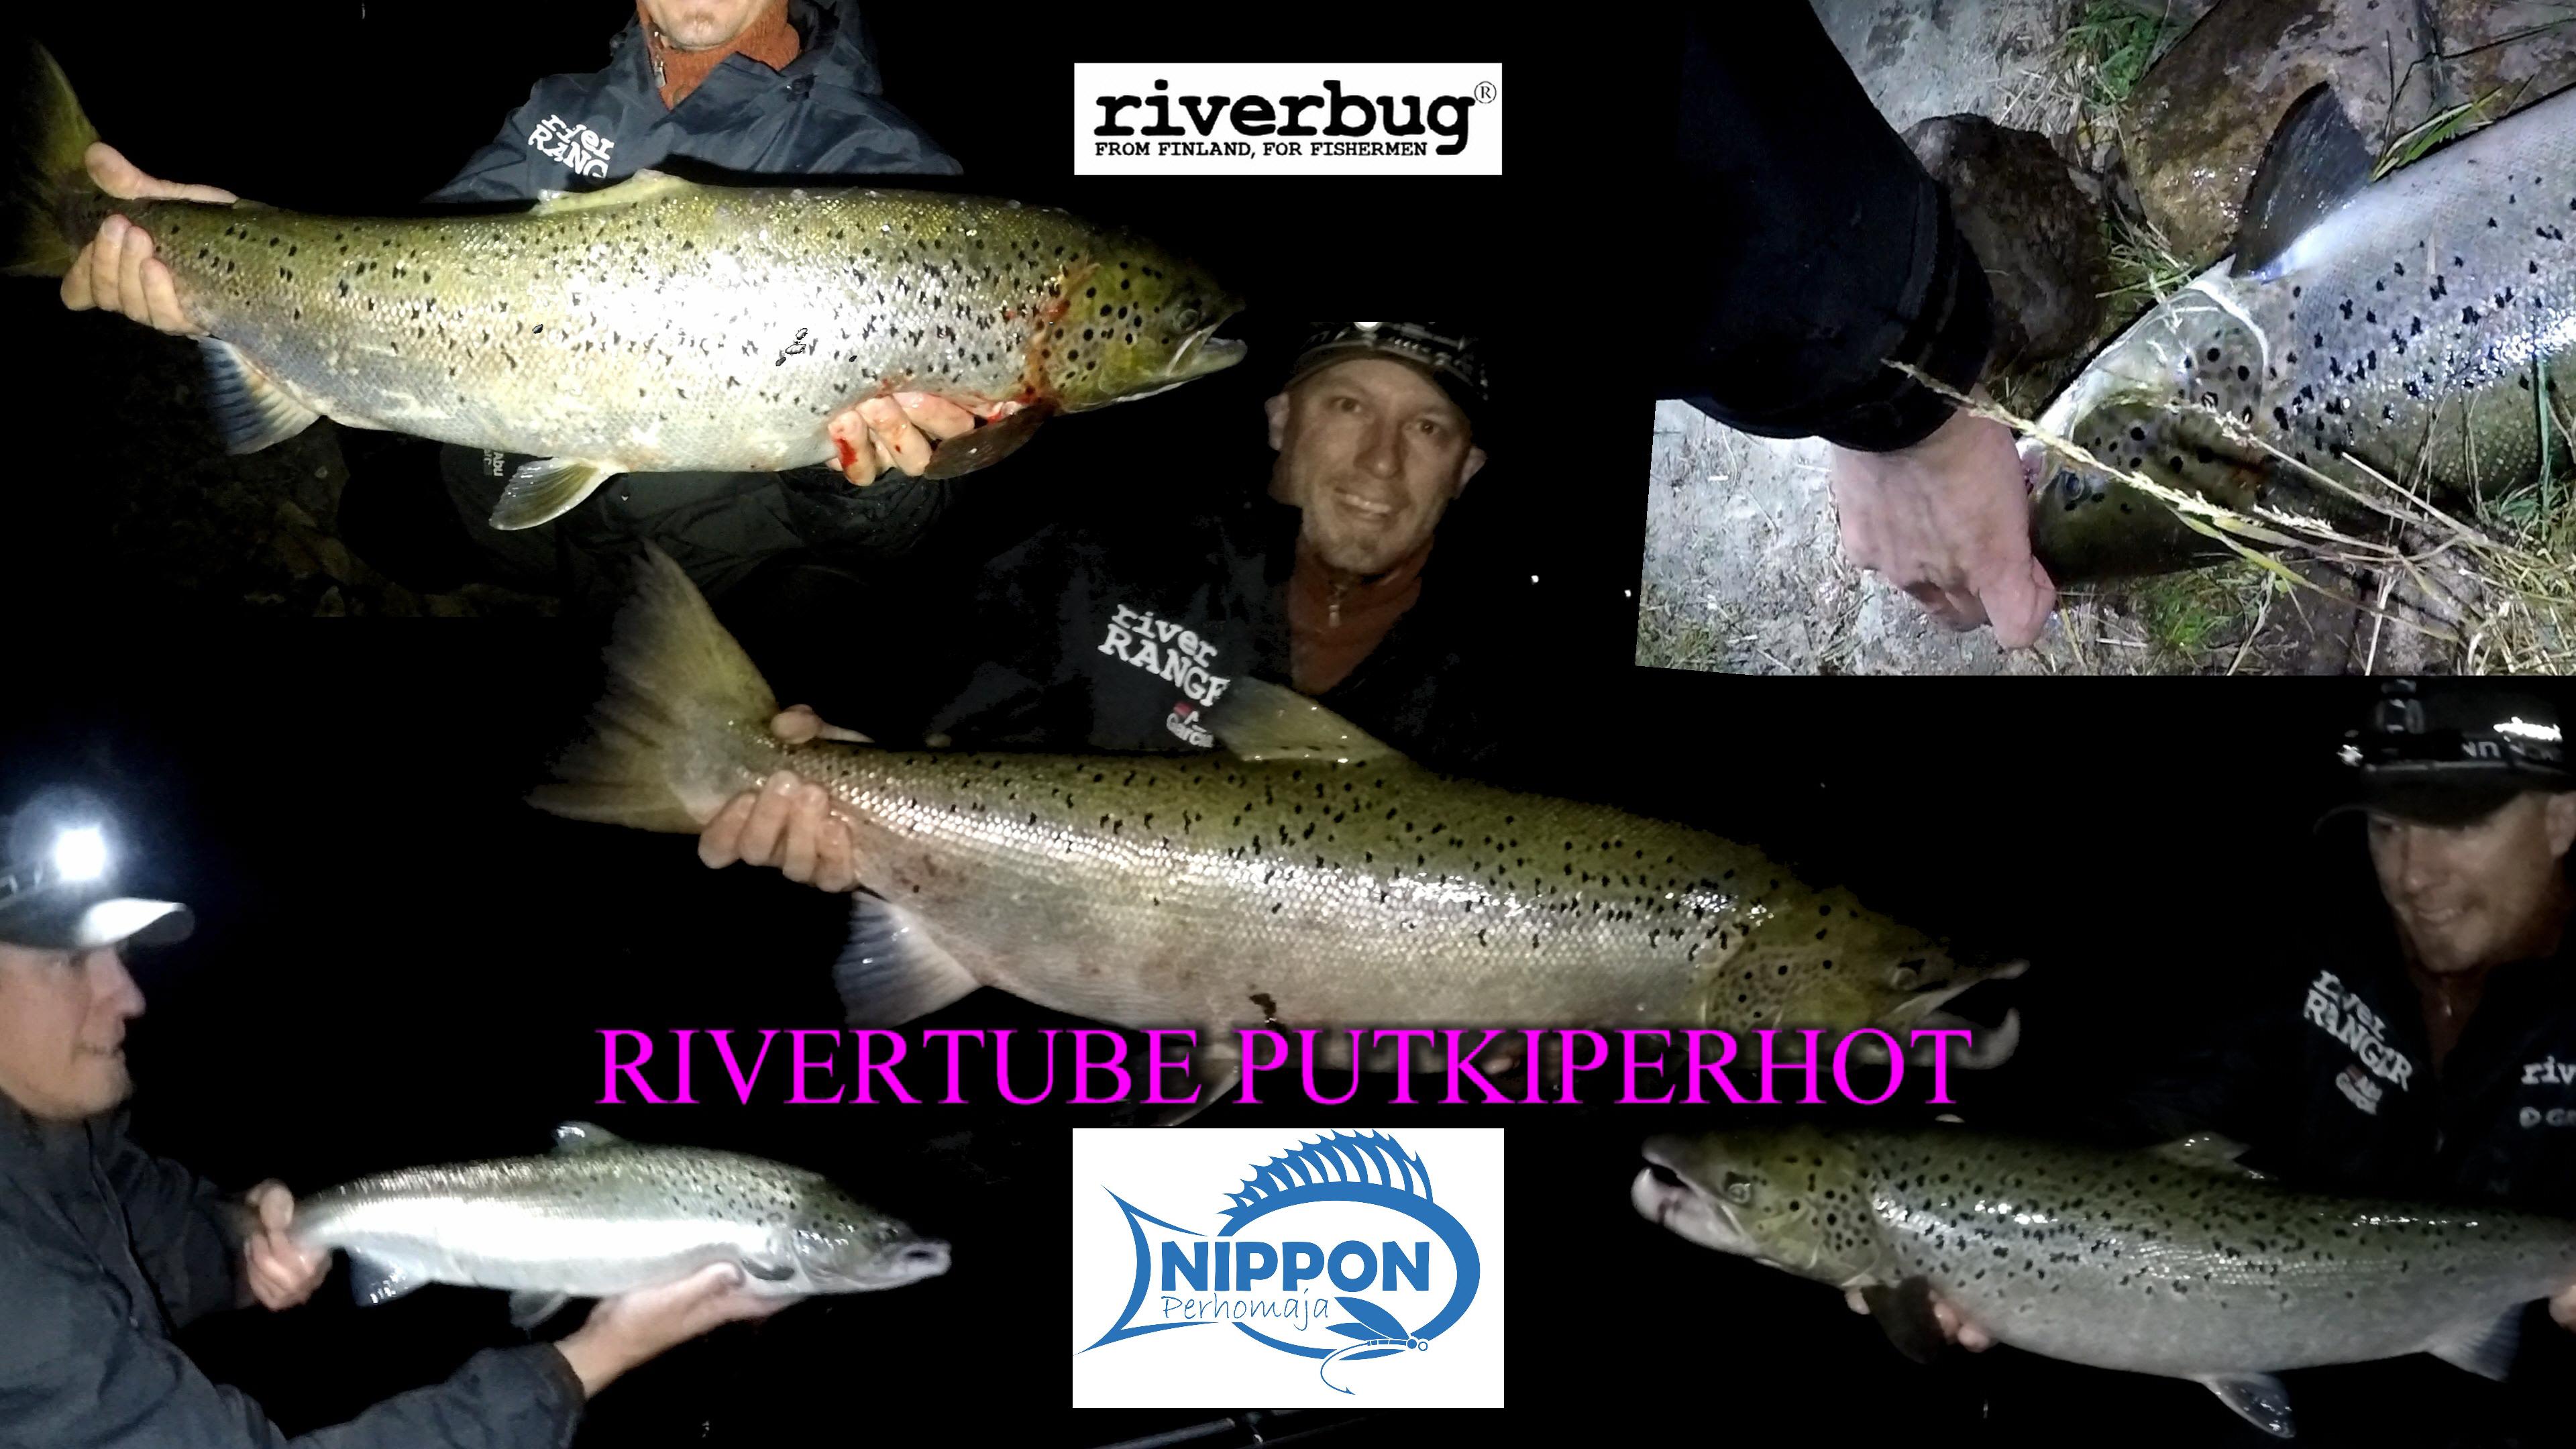 RiverTube Putkiperhot can be found in several tackle shops in Finland! #matkakoski #lohi #riverbug #putkiperhot #perhonsidonta #merikoski #boden #rivertube #merikoski #oulu